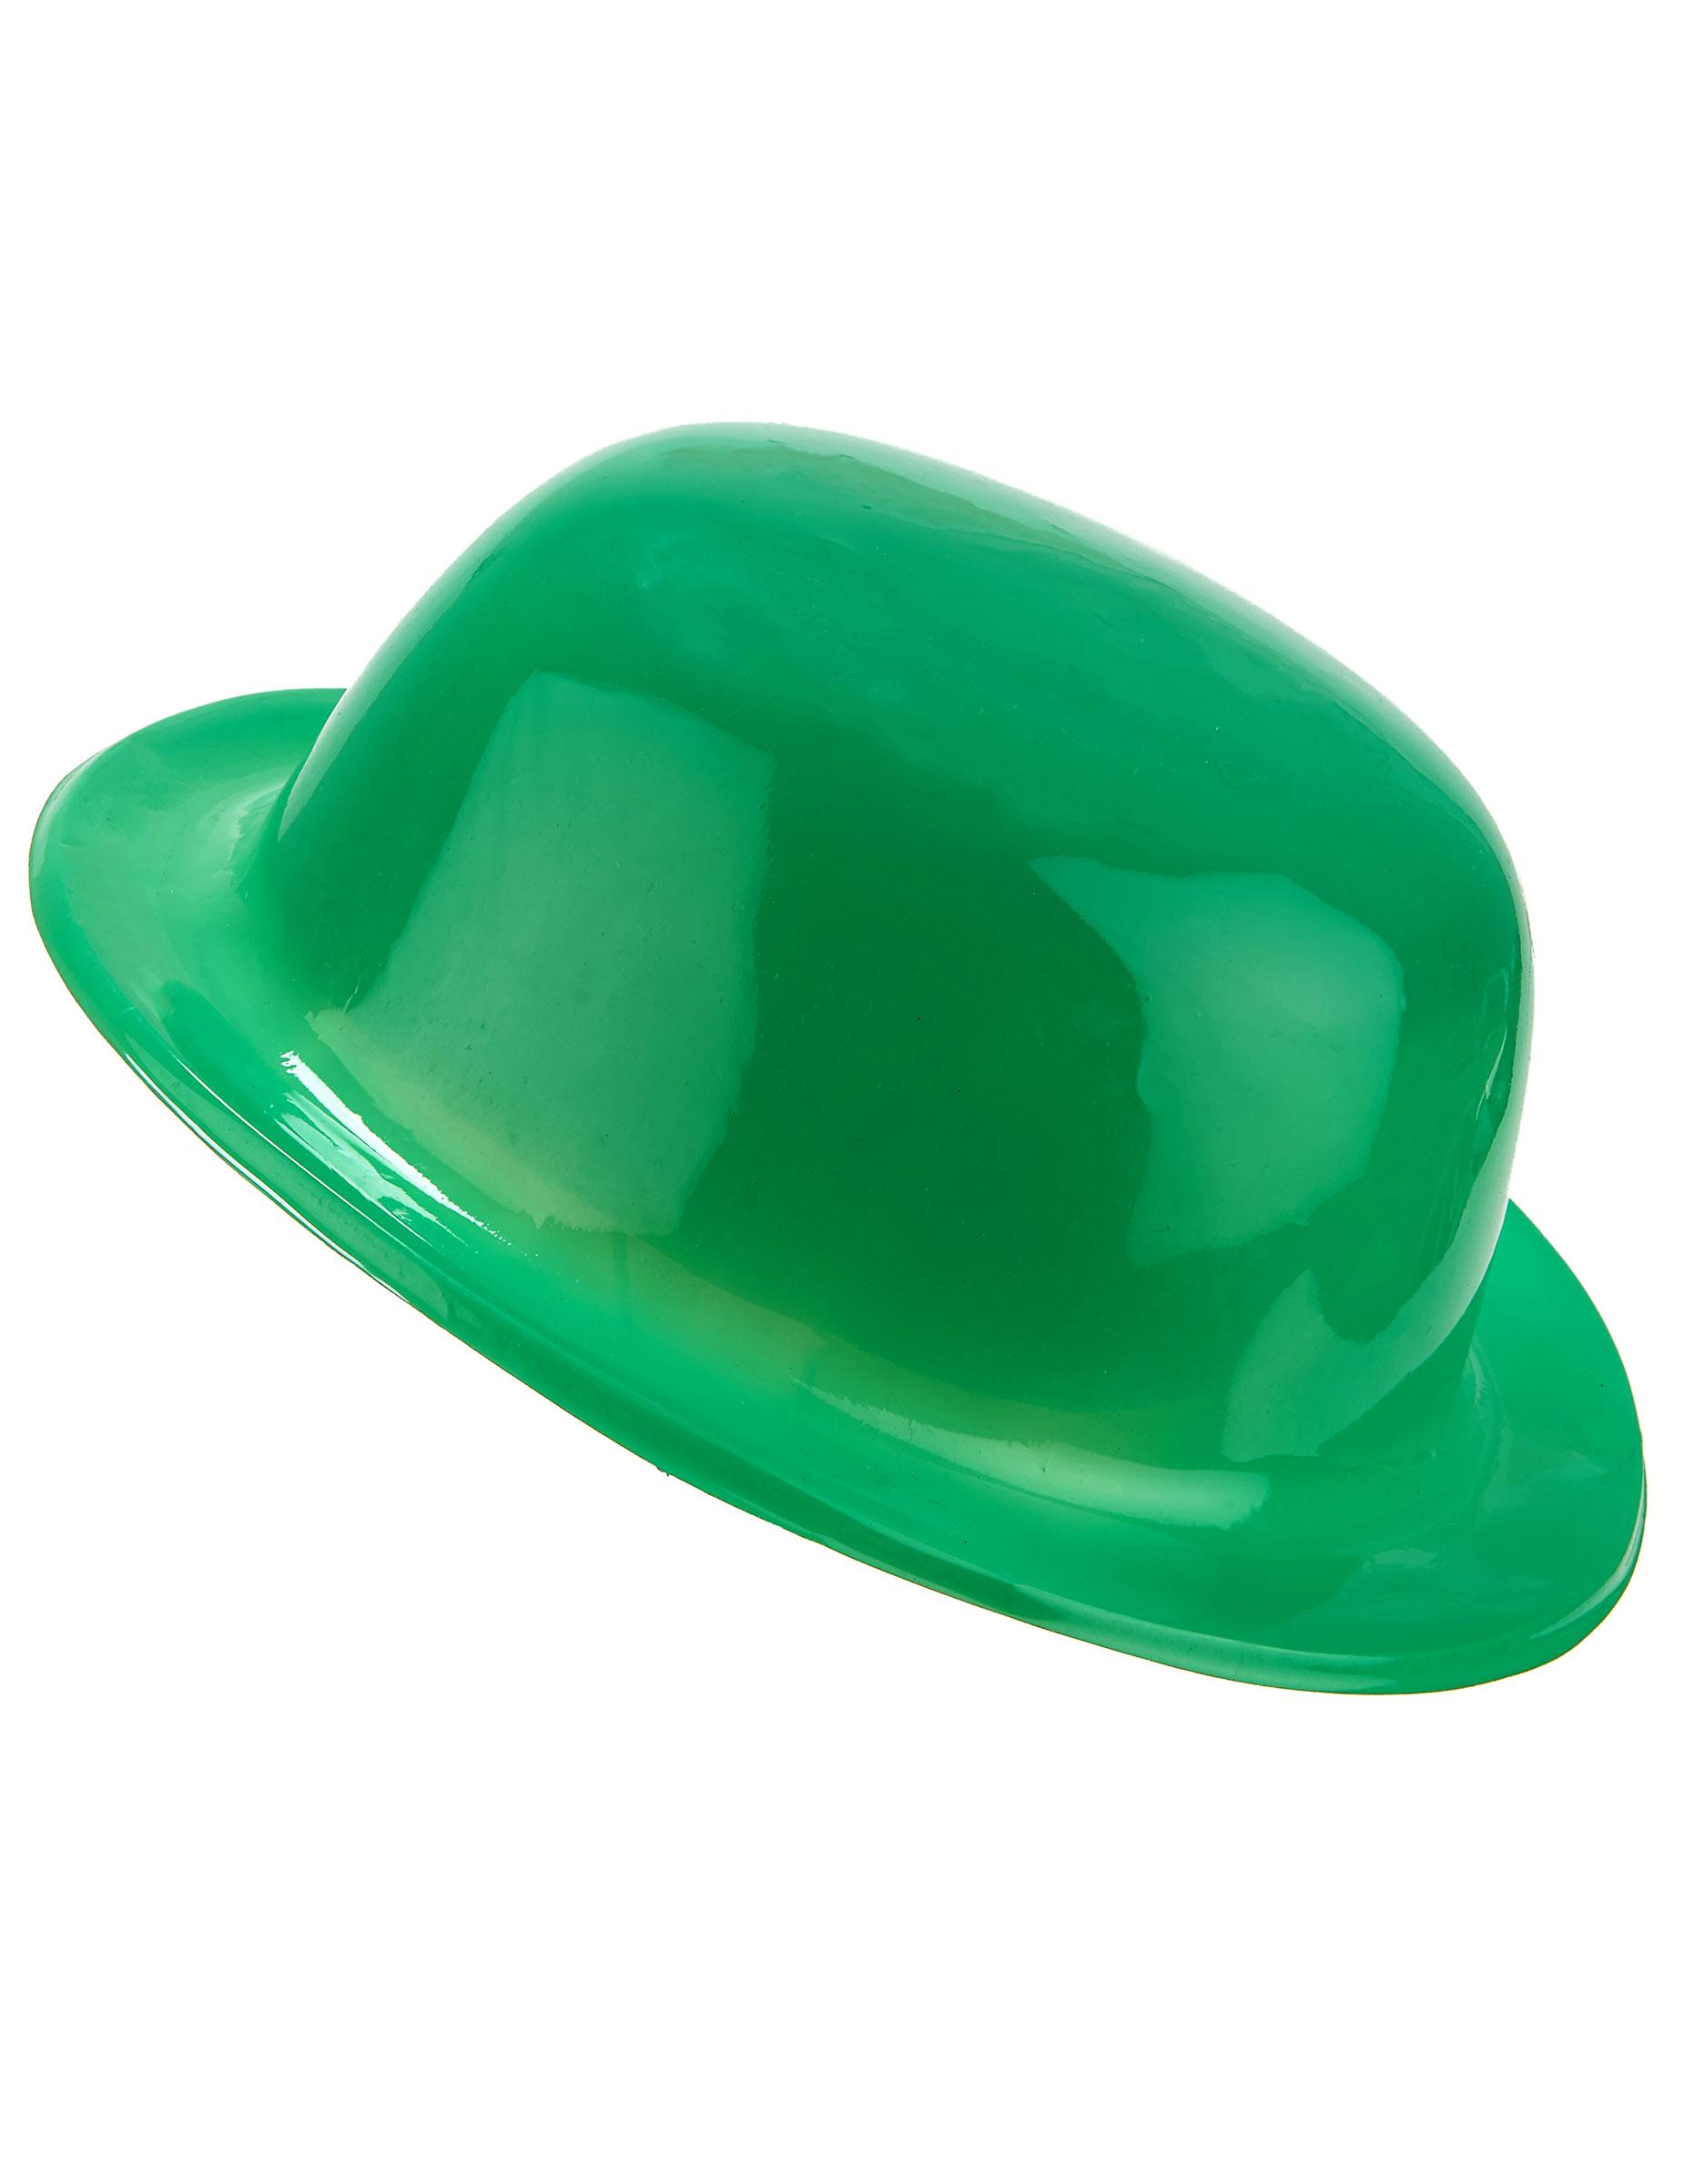 Cappelli travestimenti  cappelli strani c3420b82abb1